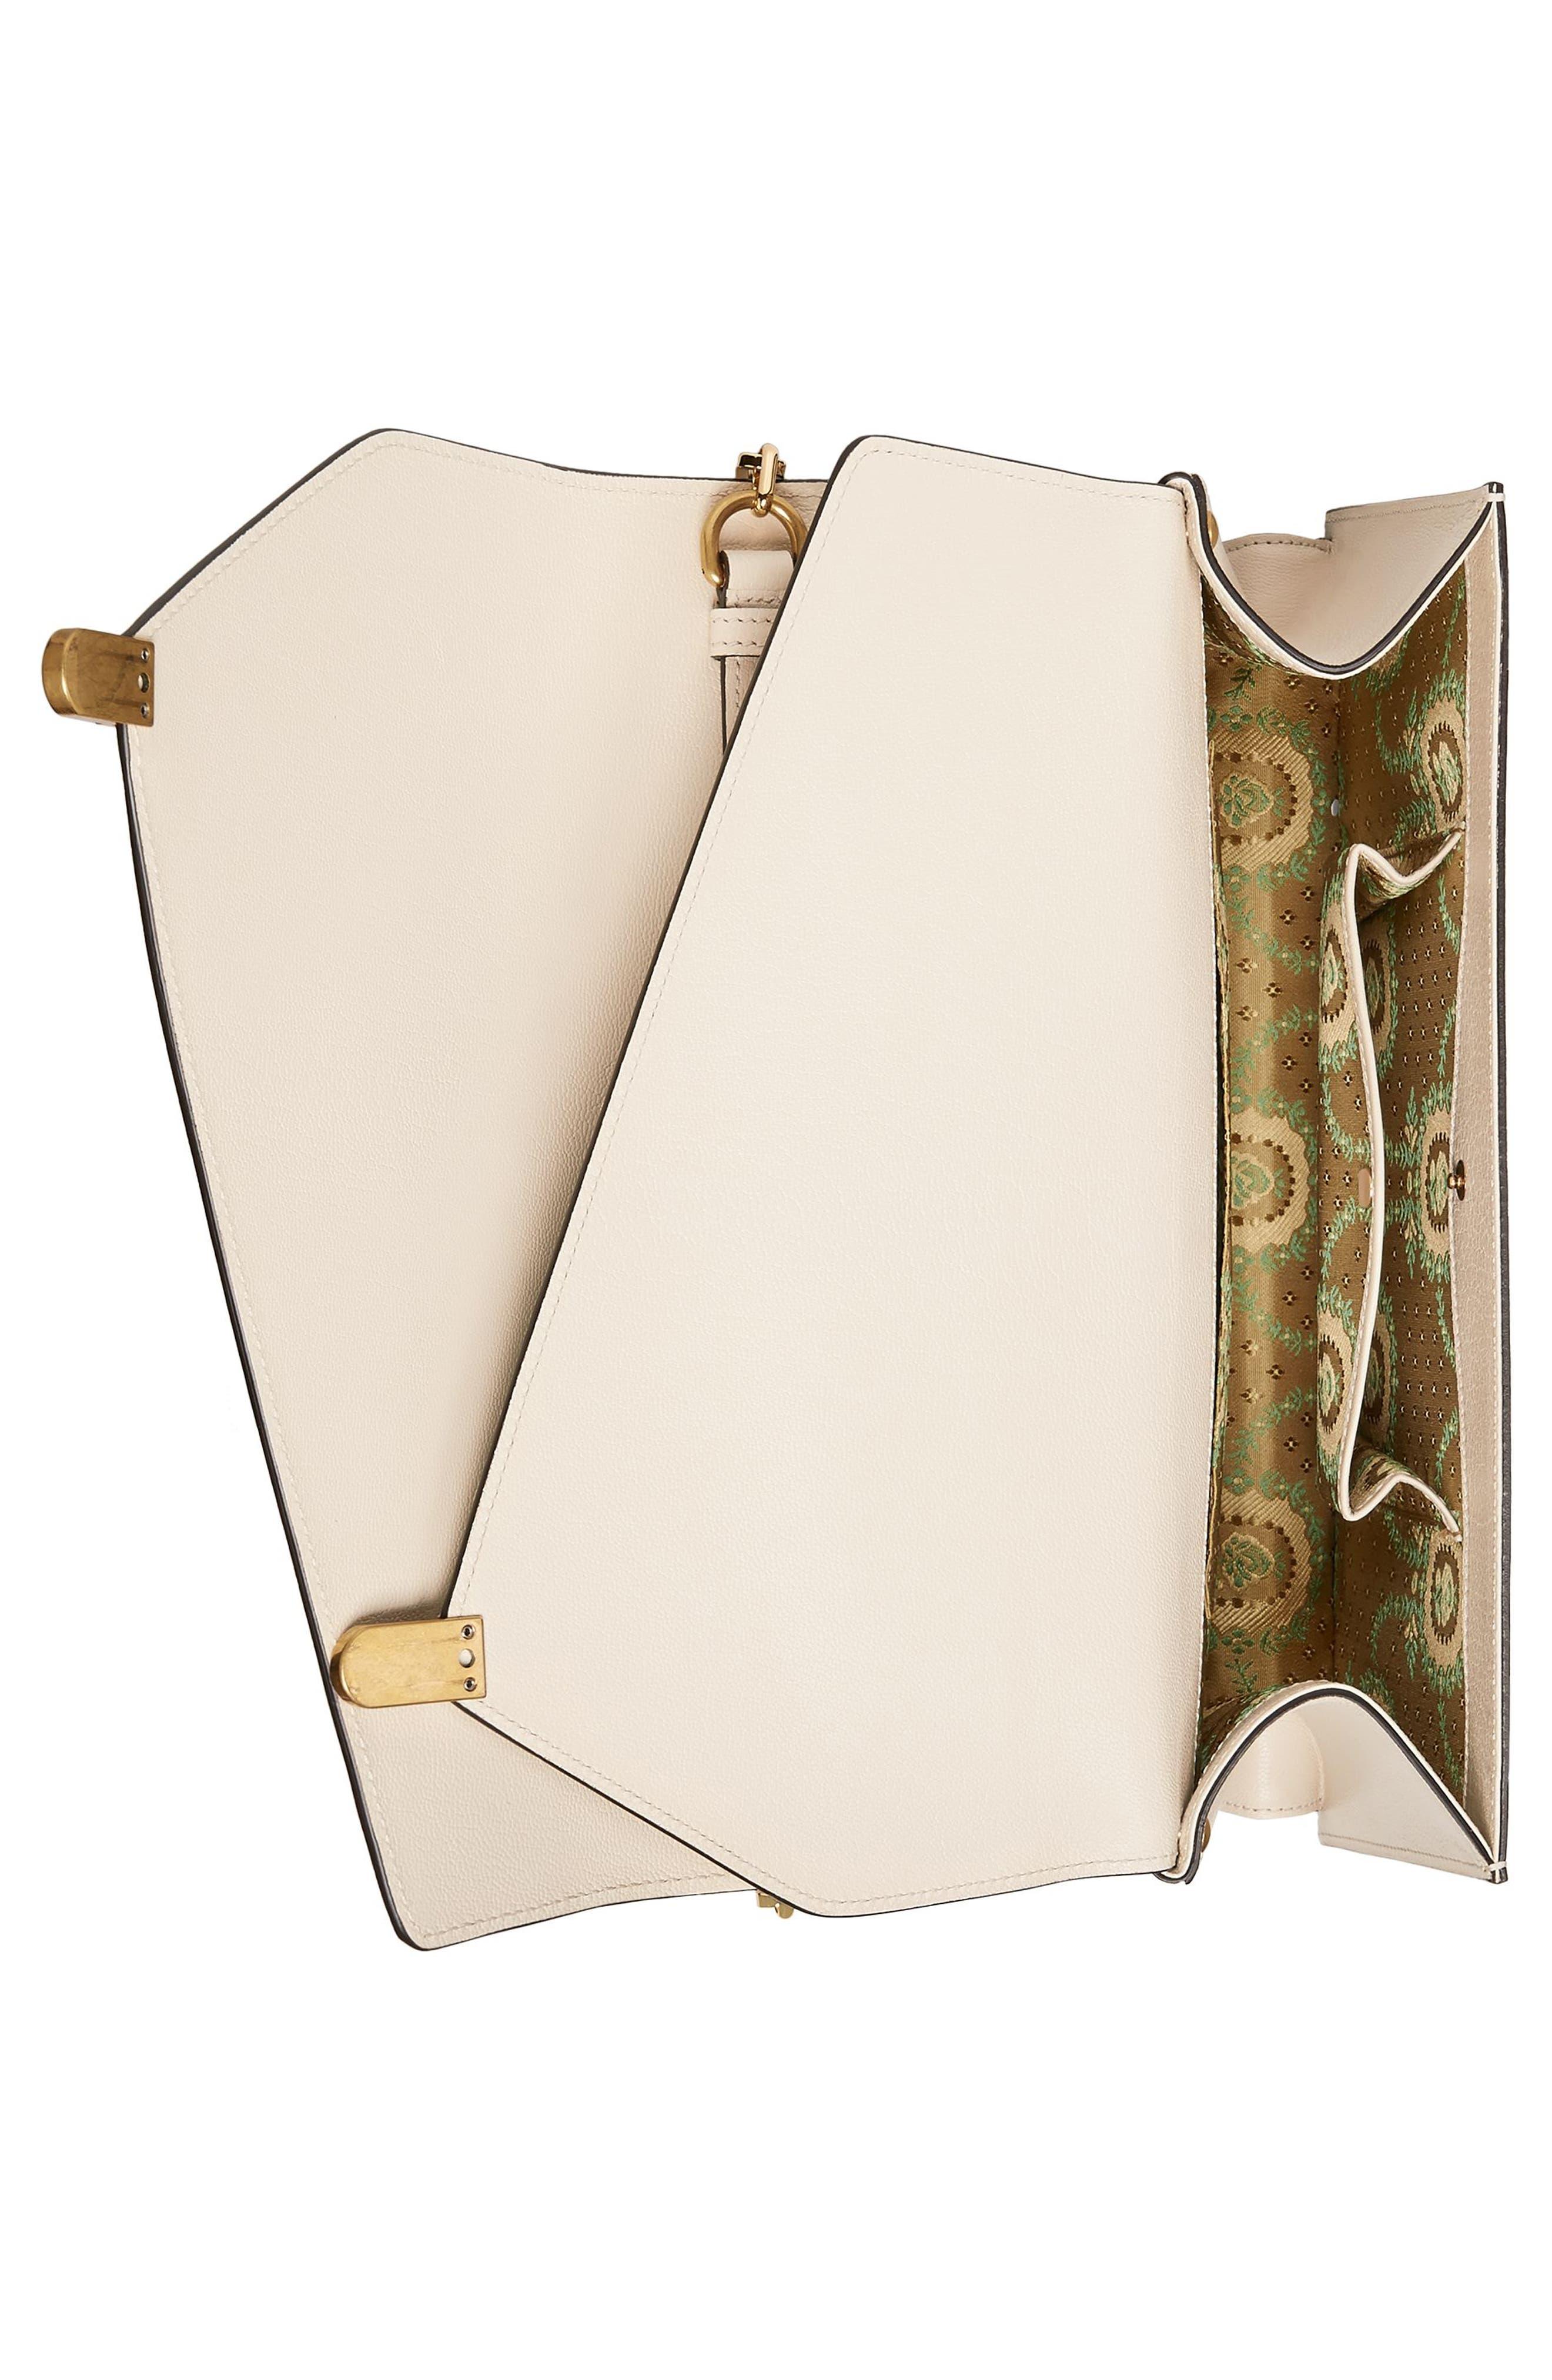 Medium Linea P Butterfly Painted Leather & Genuine Snakeskin Top Handle Satchel,                             Alternate thumbnail 4, color,                             White/ Multi